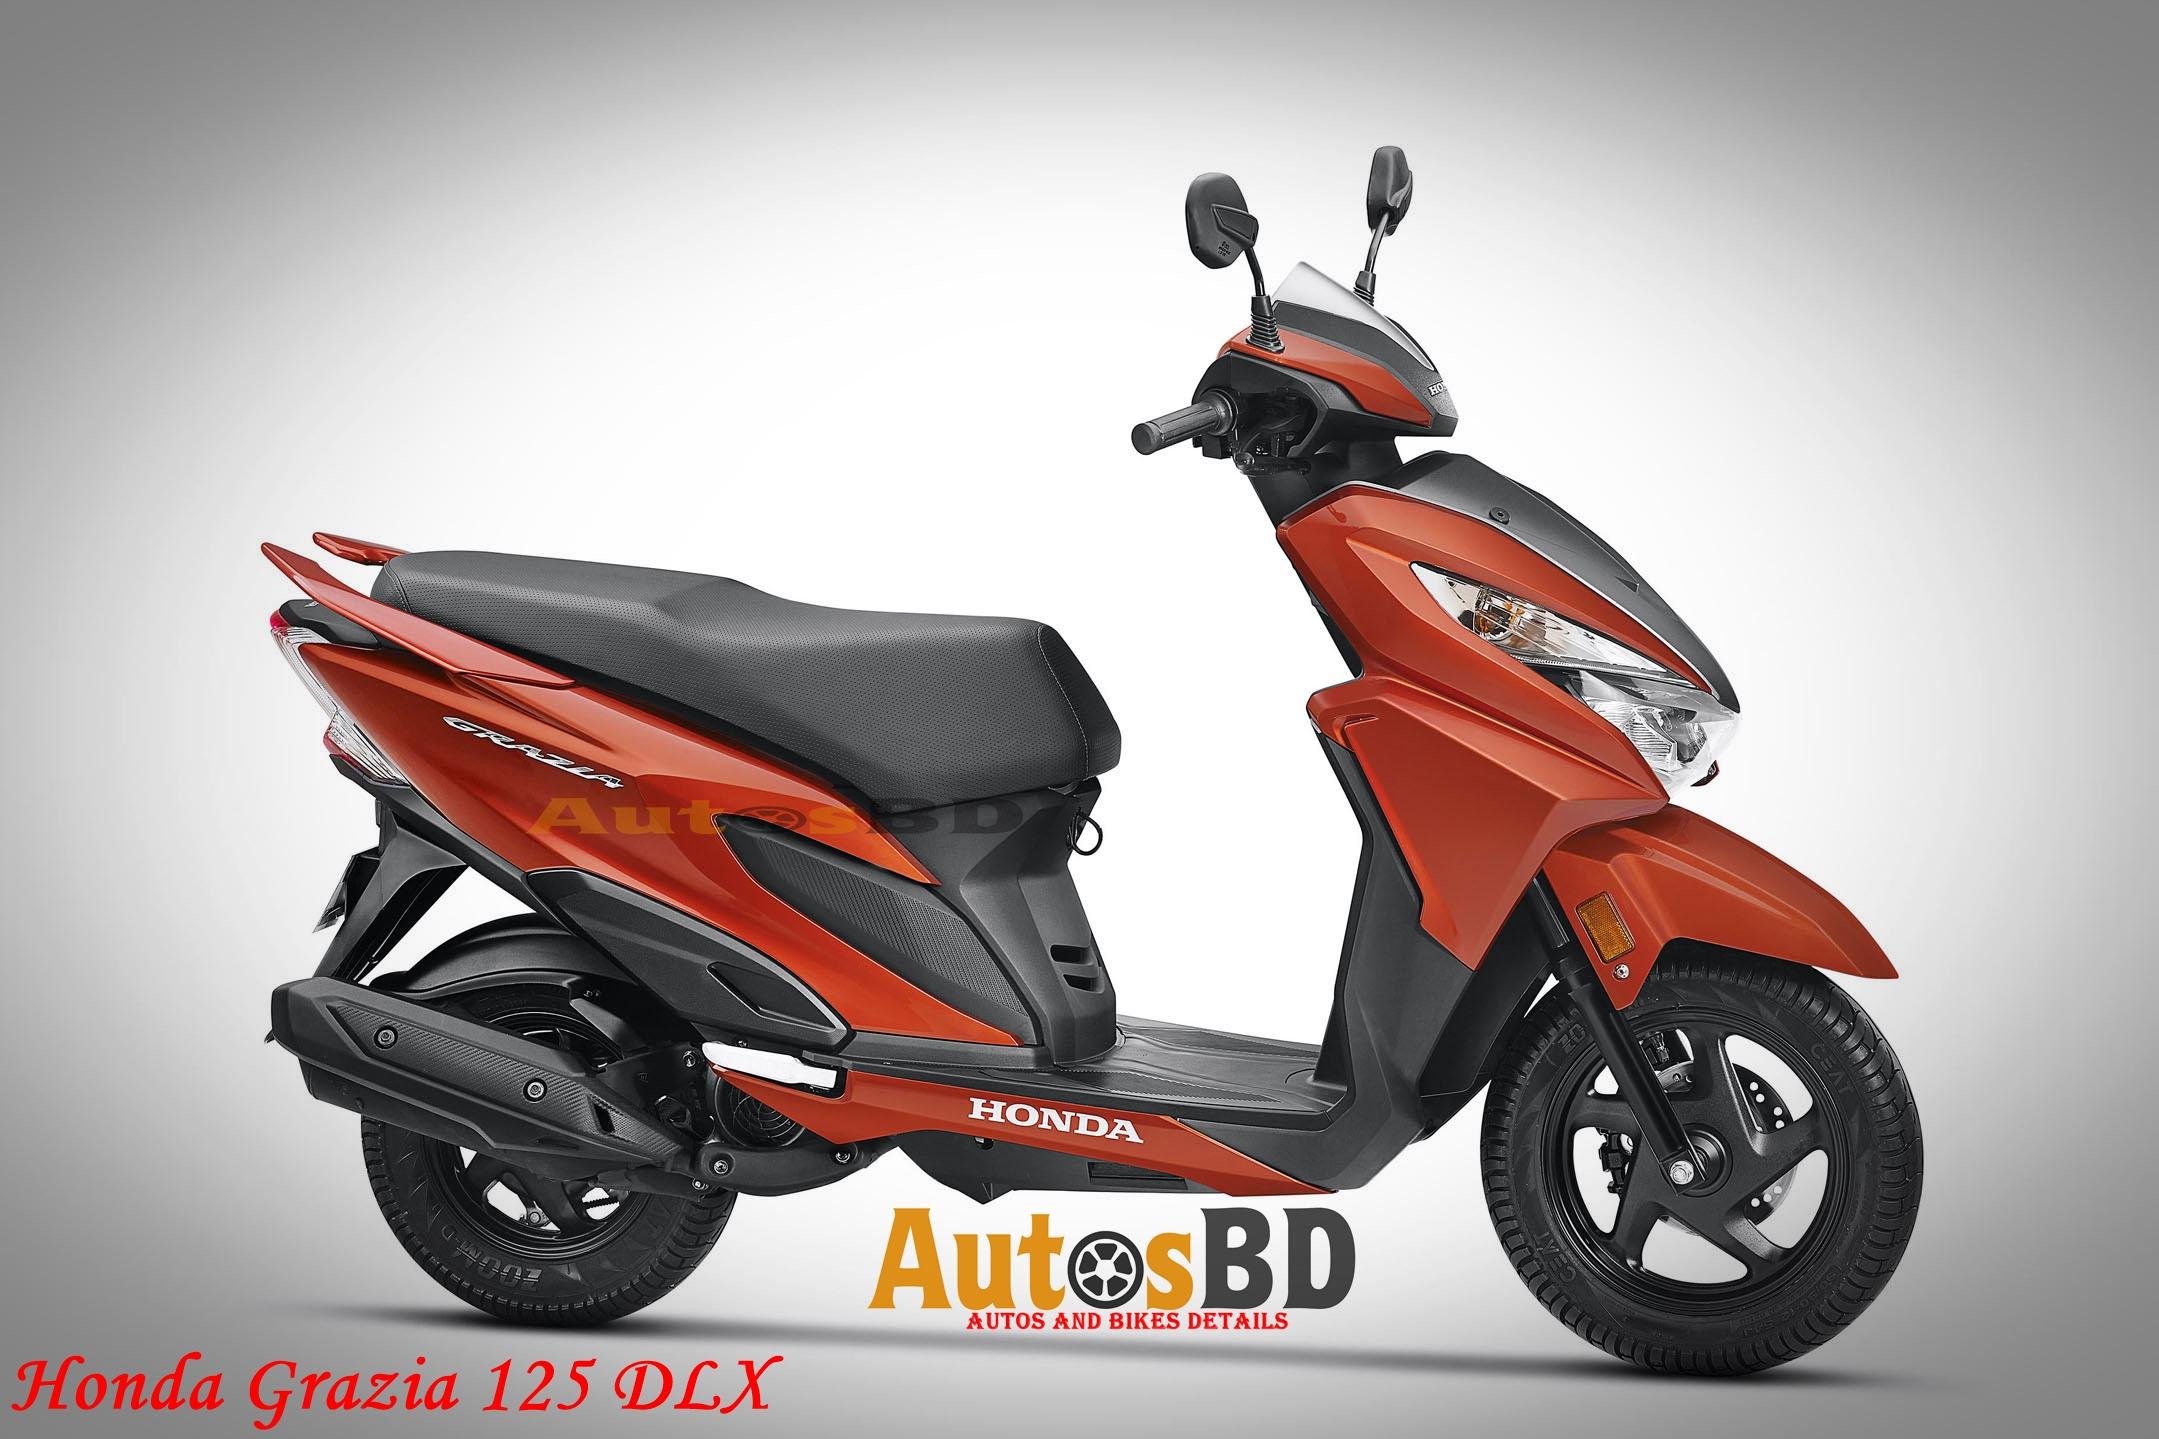 Honda Grazia 125 DLX Motorcycle Specification